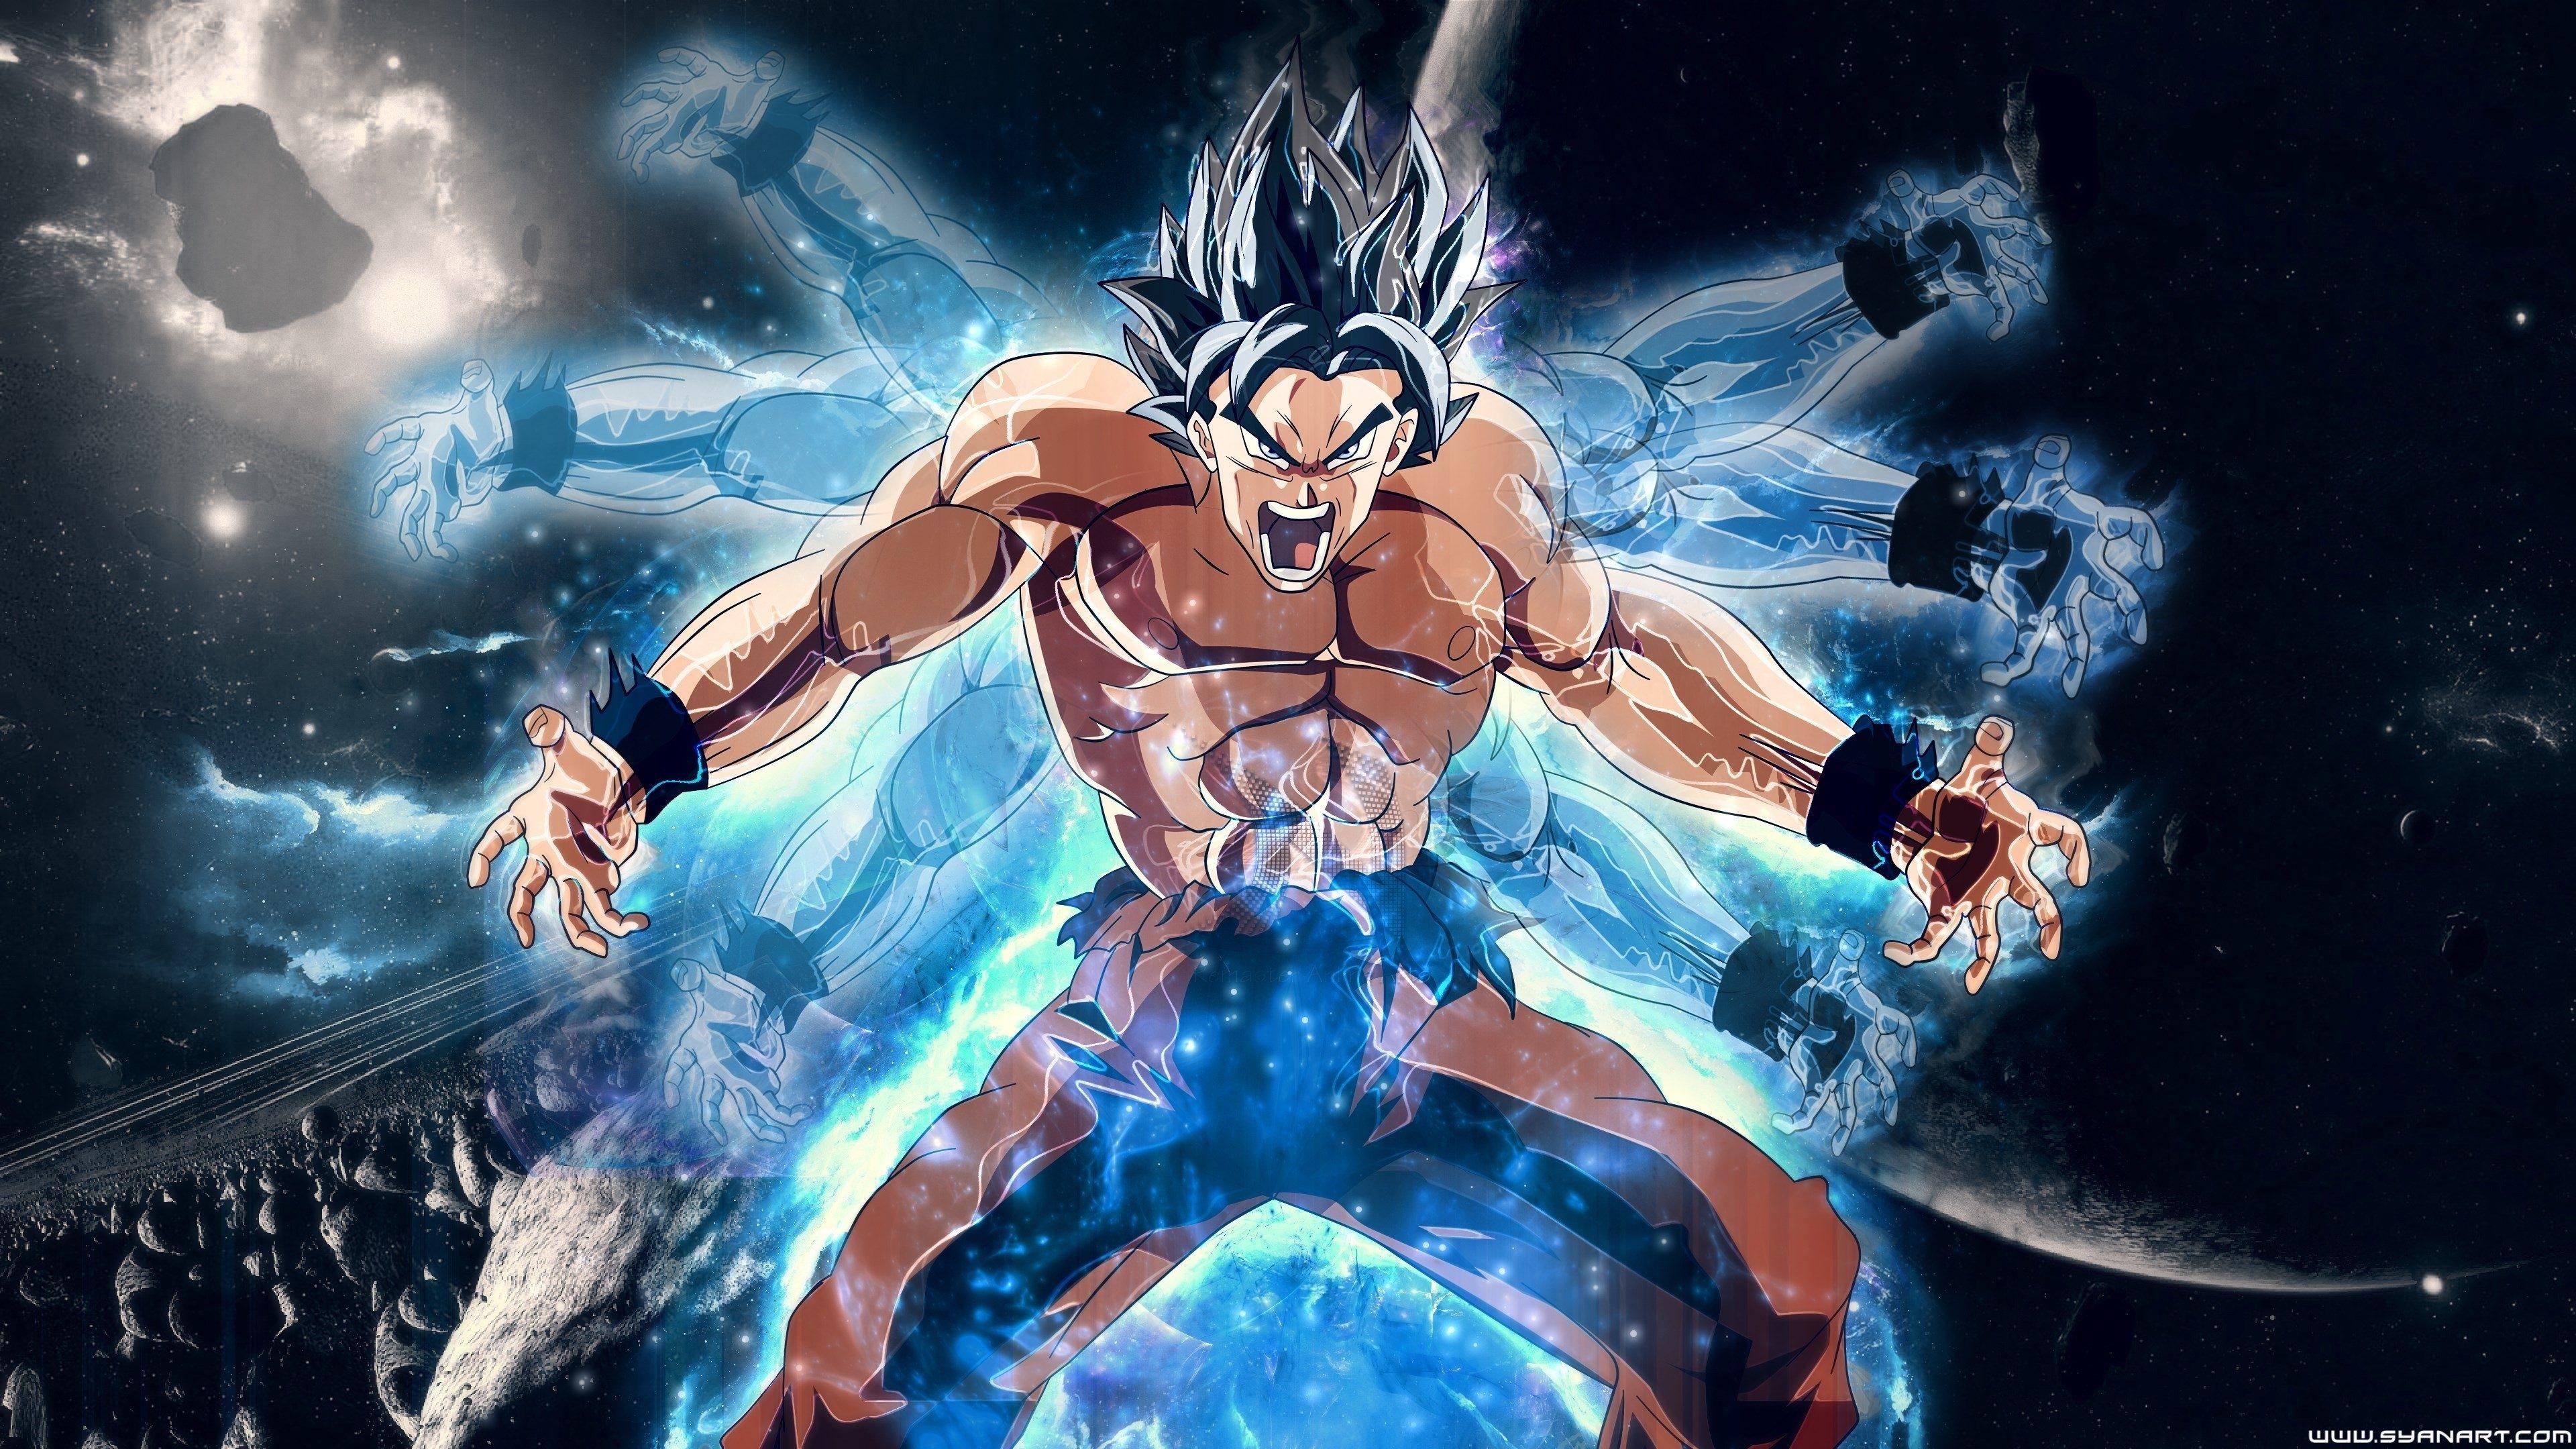 10 Most Popular Hd Dragon Ball Wallpaper Full Hd 1080p For Pc